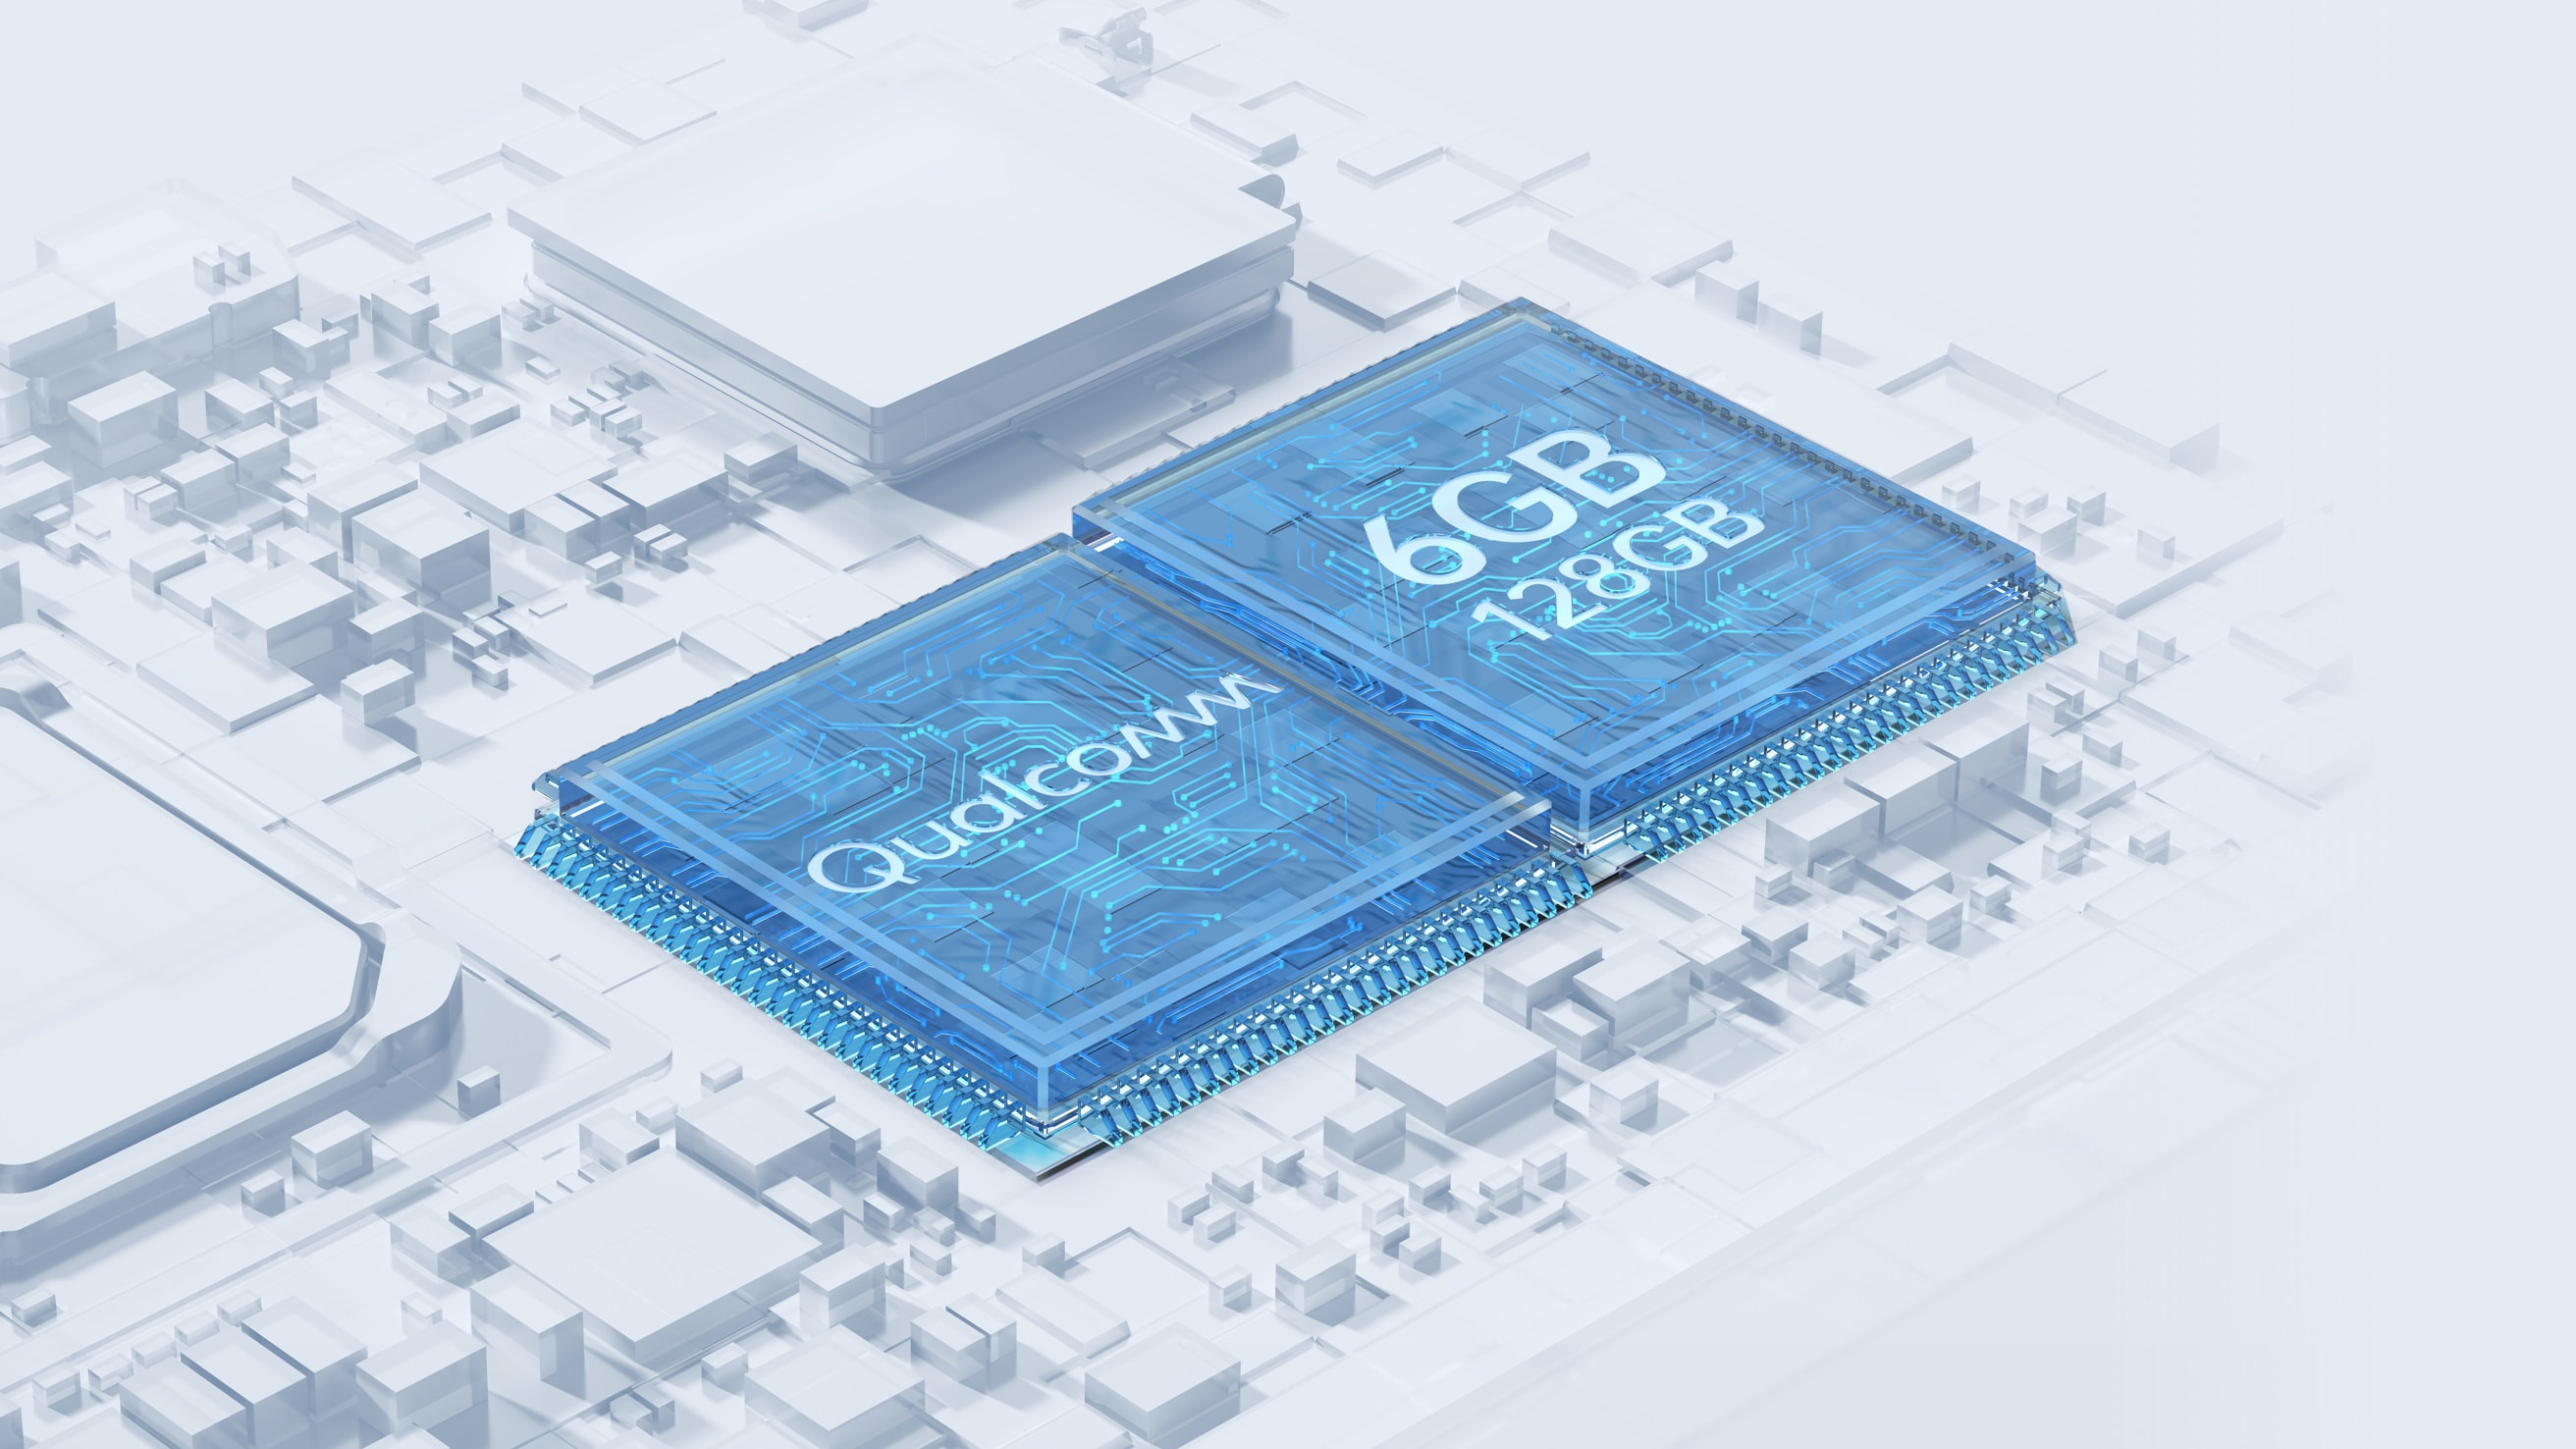 OPPO F19 6GB RAM + 128GB ROM